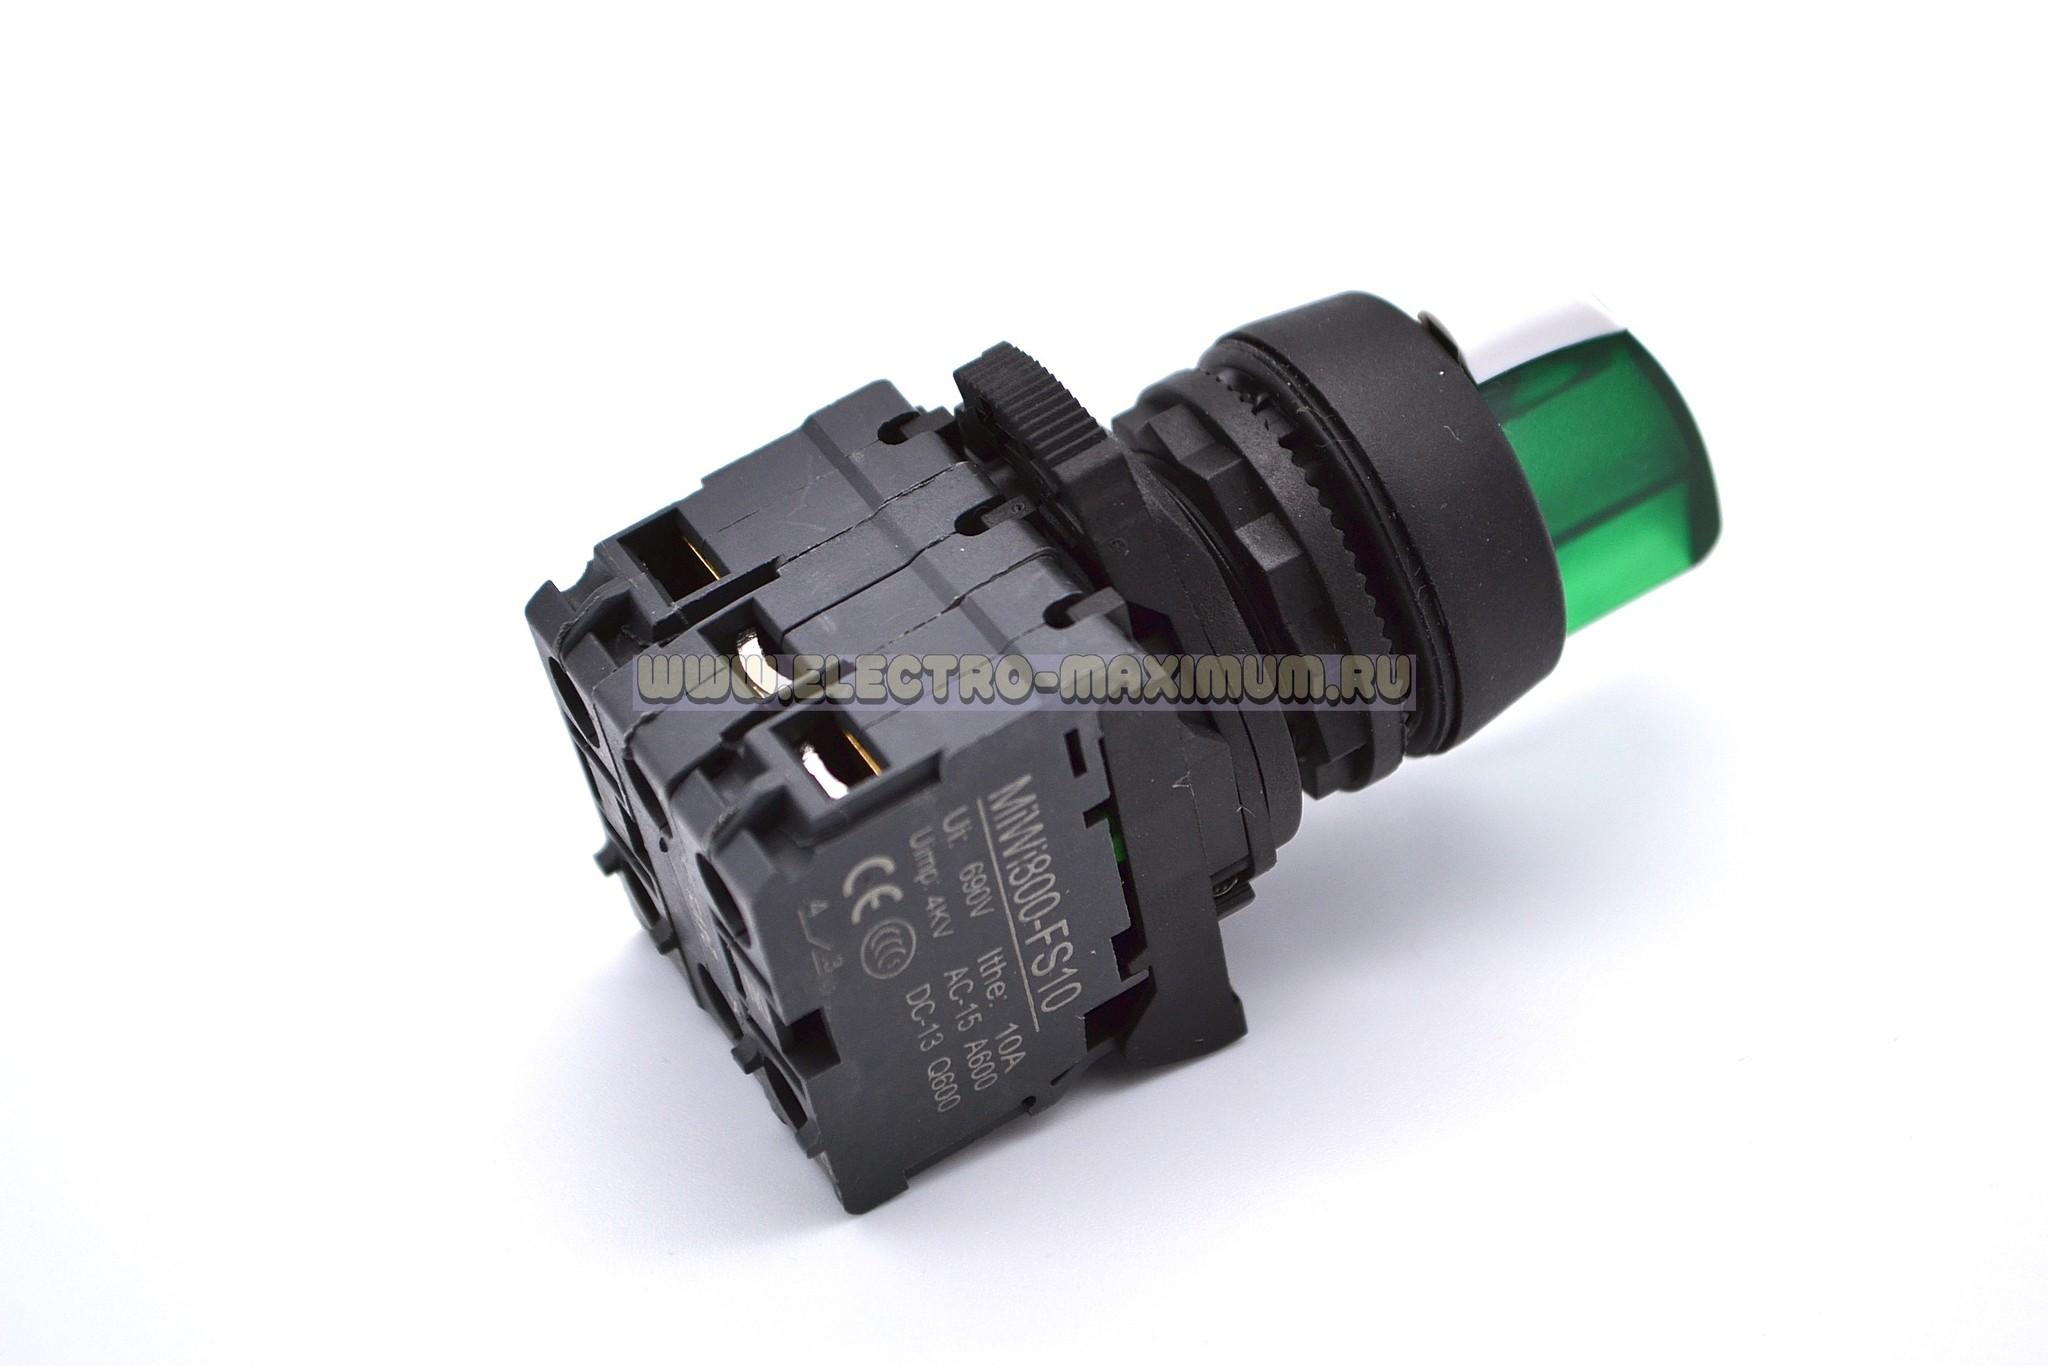 MIWI800-FS-4D